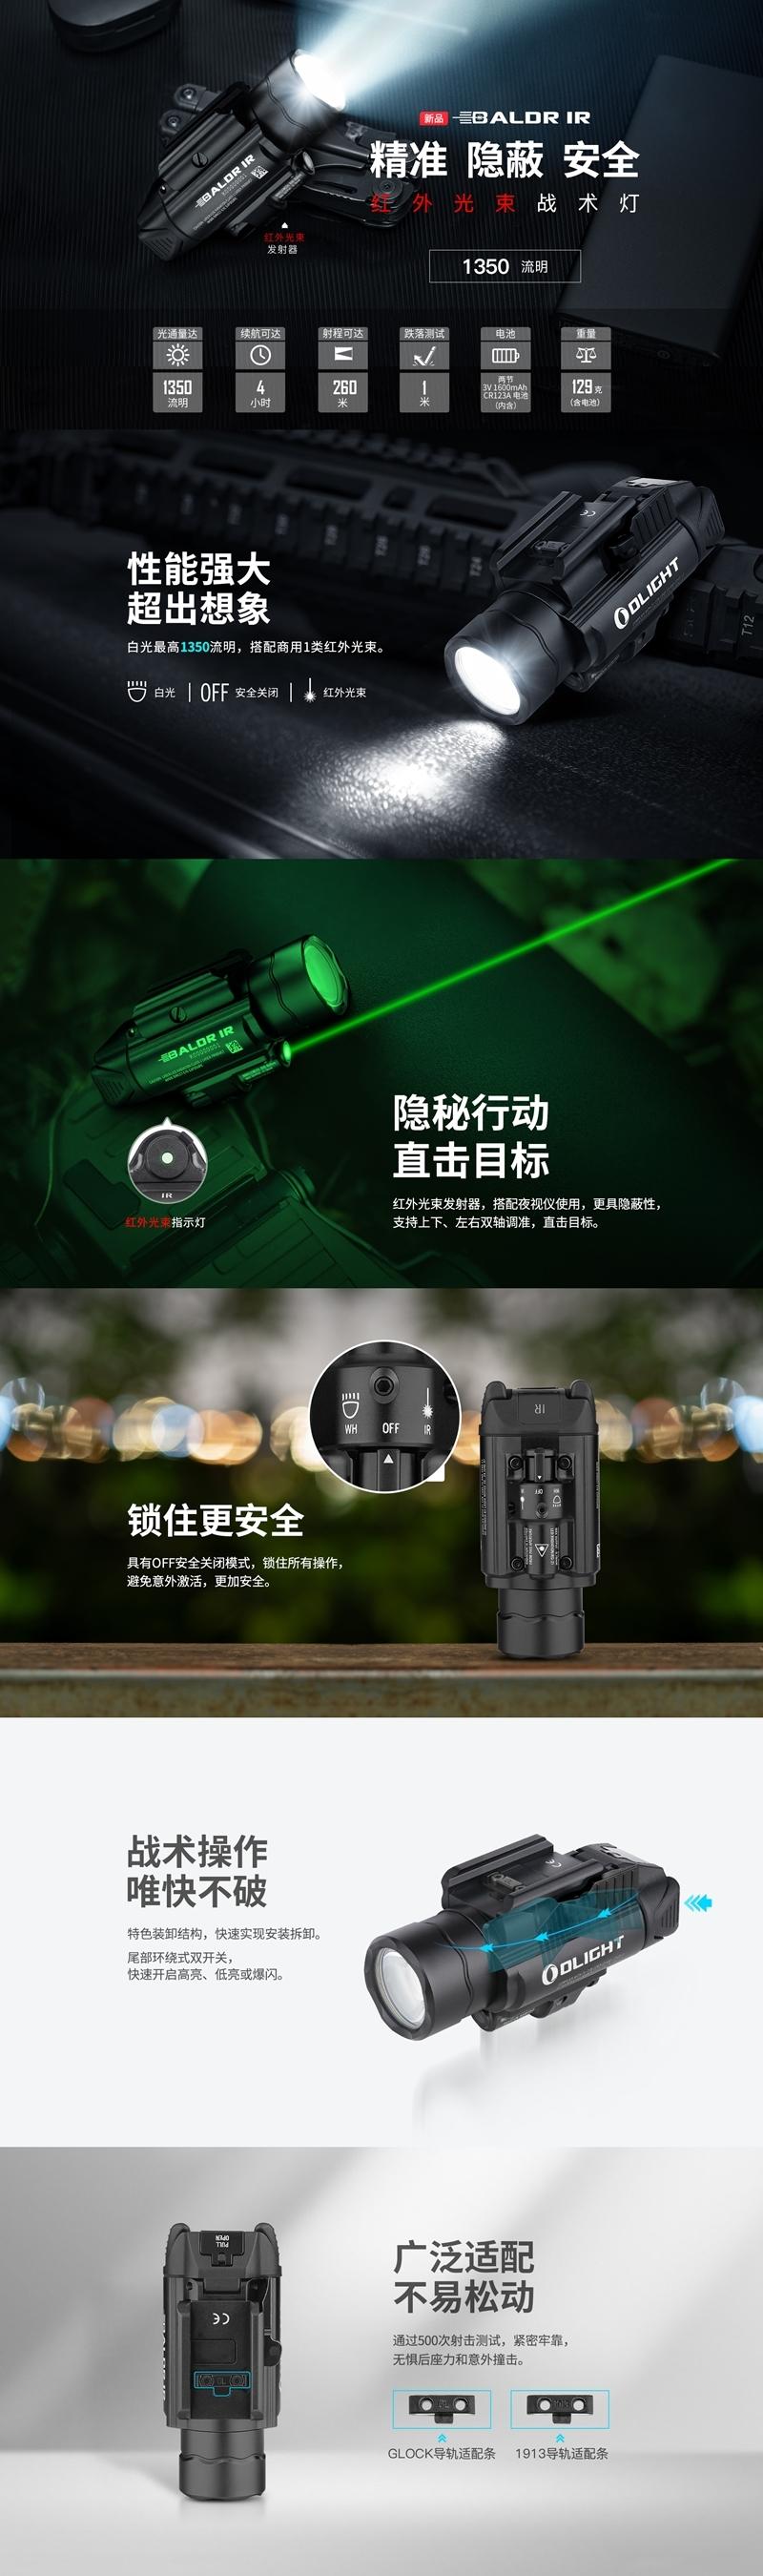 Baldr IR 1350流明 紅外線 瞄準器 白光LED 戰術 槍燈 850nm 0.78mW 紅外線光束 錸特光電 OLIGHT 台灣總代理-13